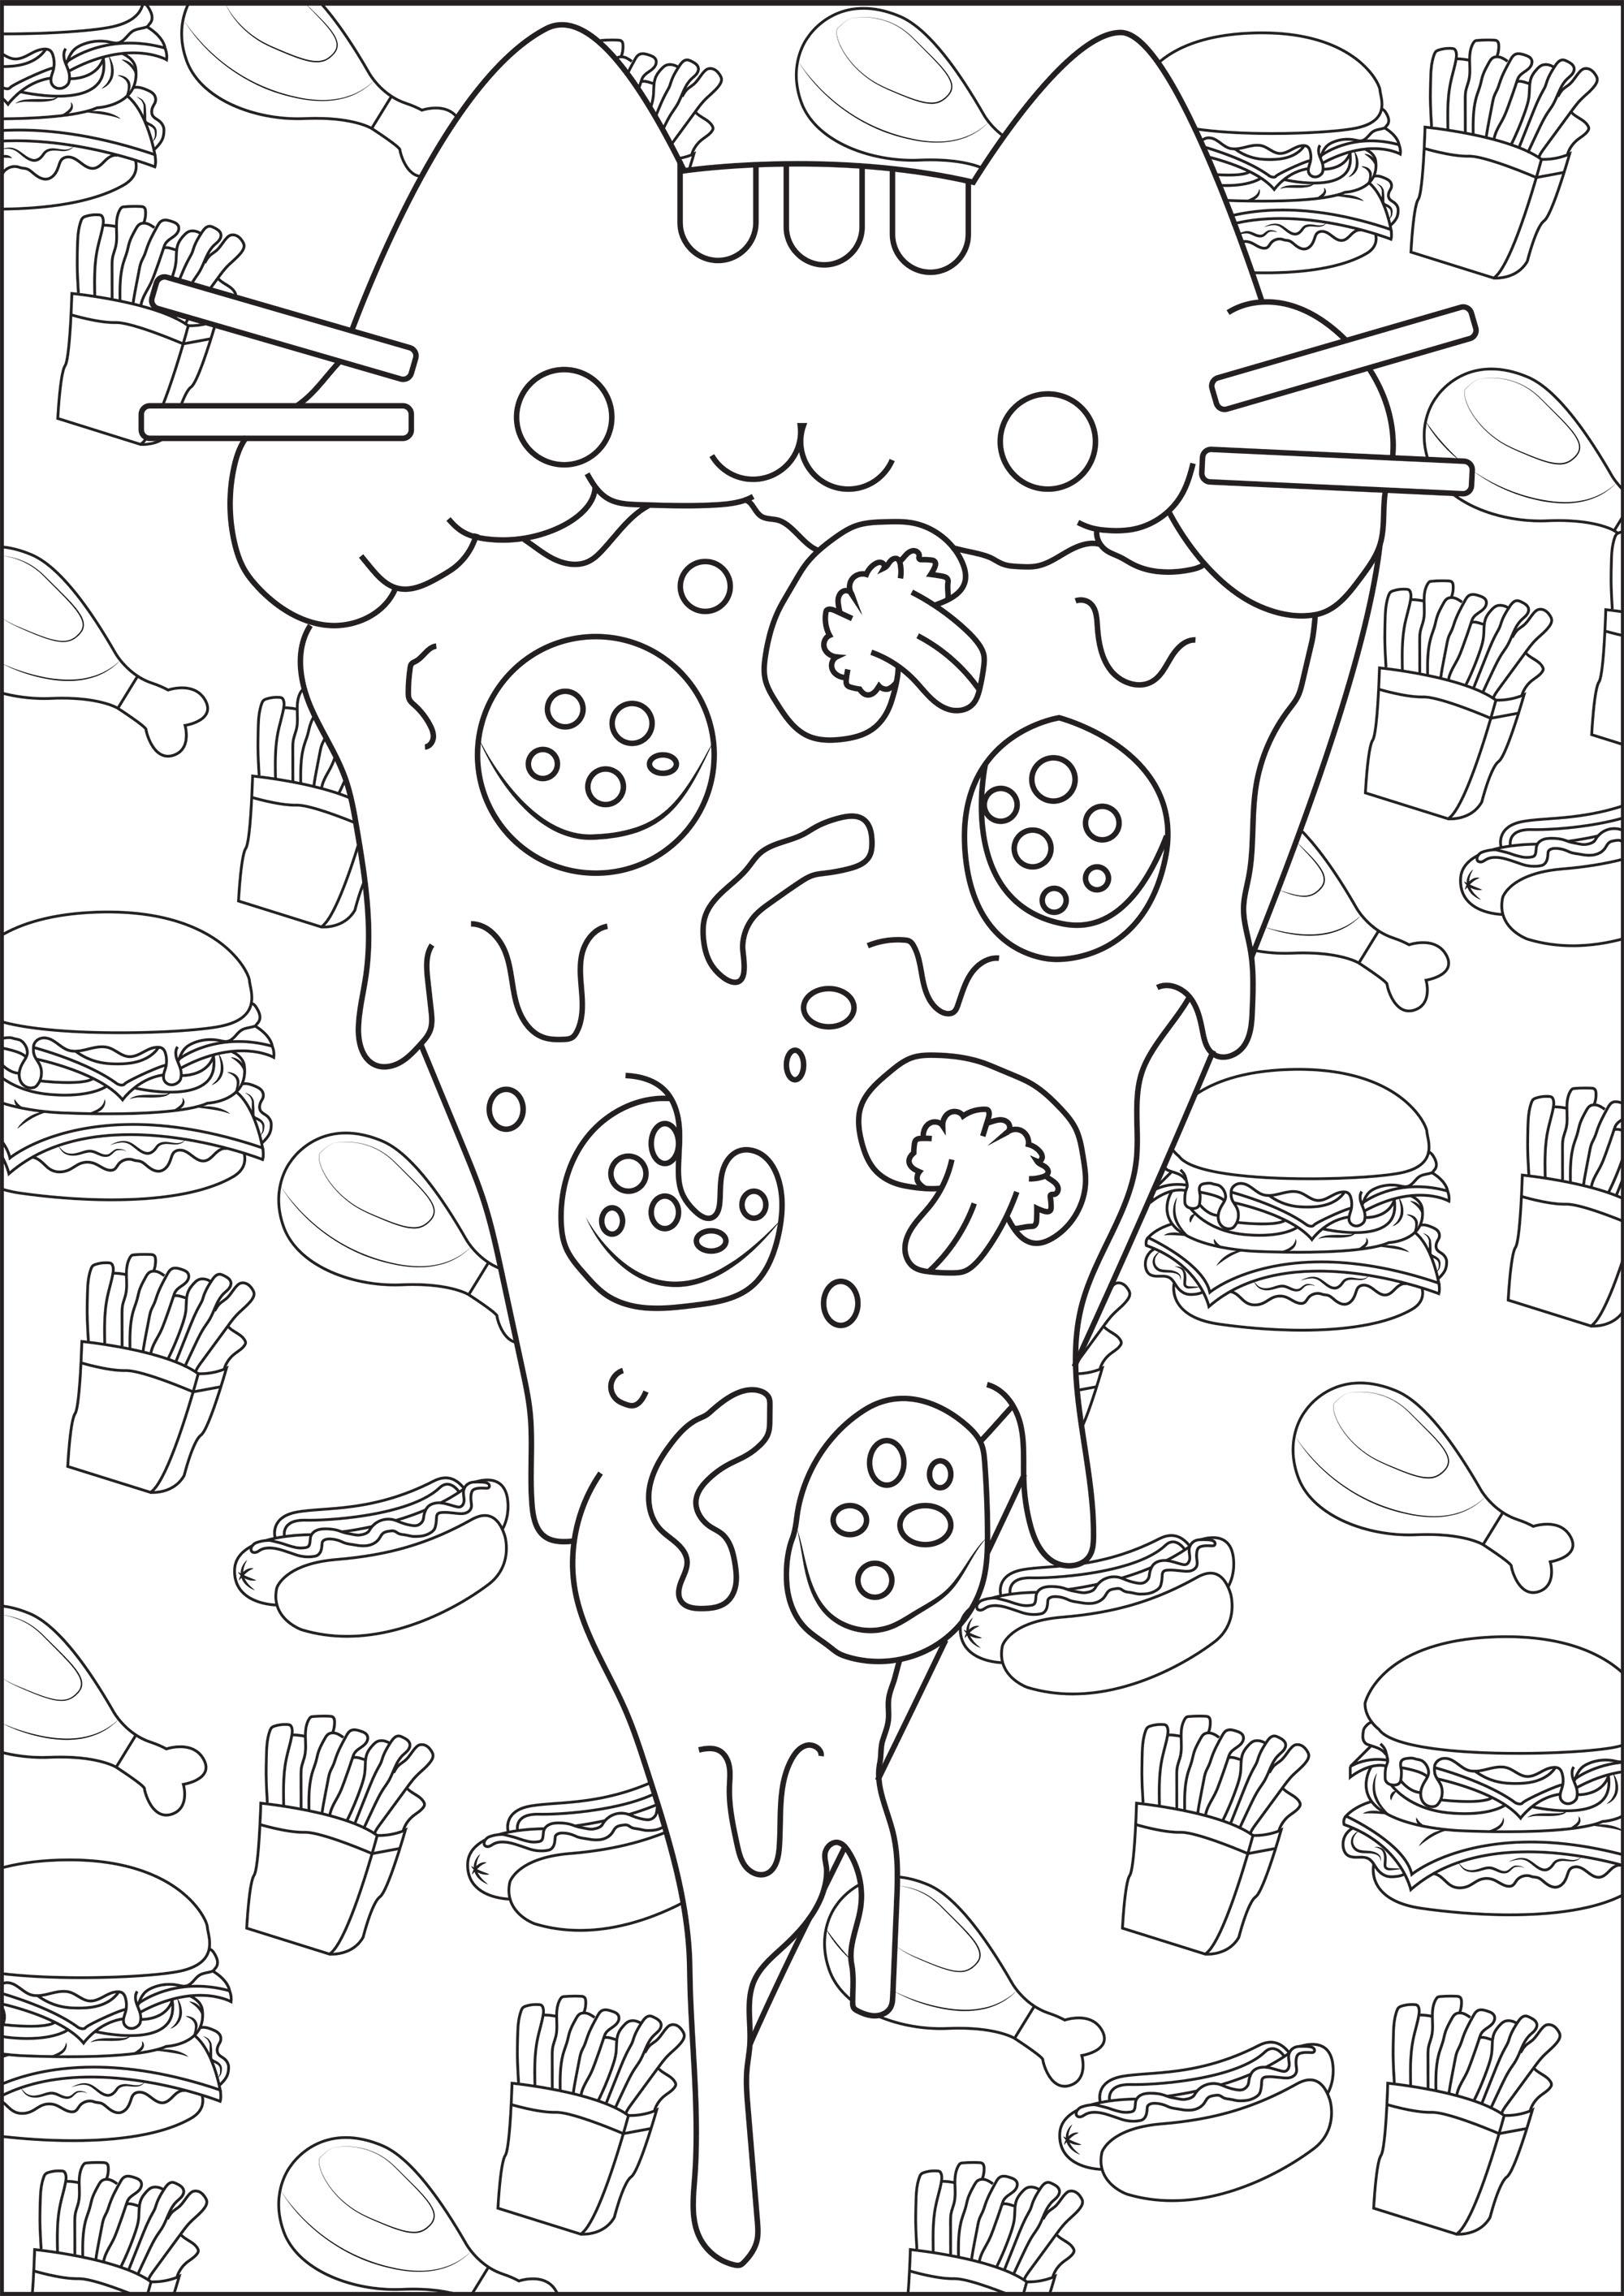 Disegni da Colorare per Adulti : Doodle art / Doodling - 3